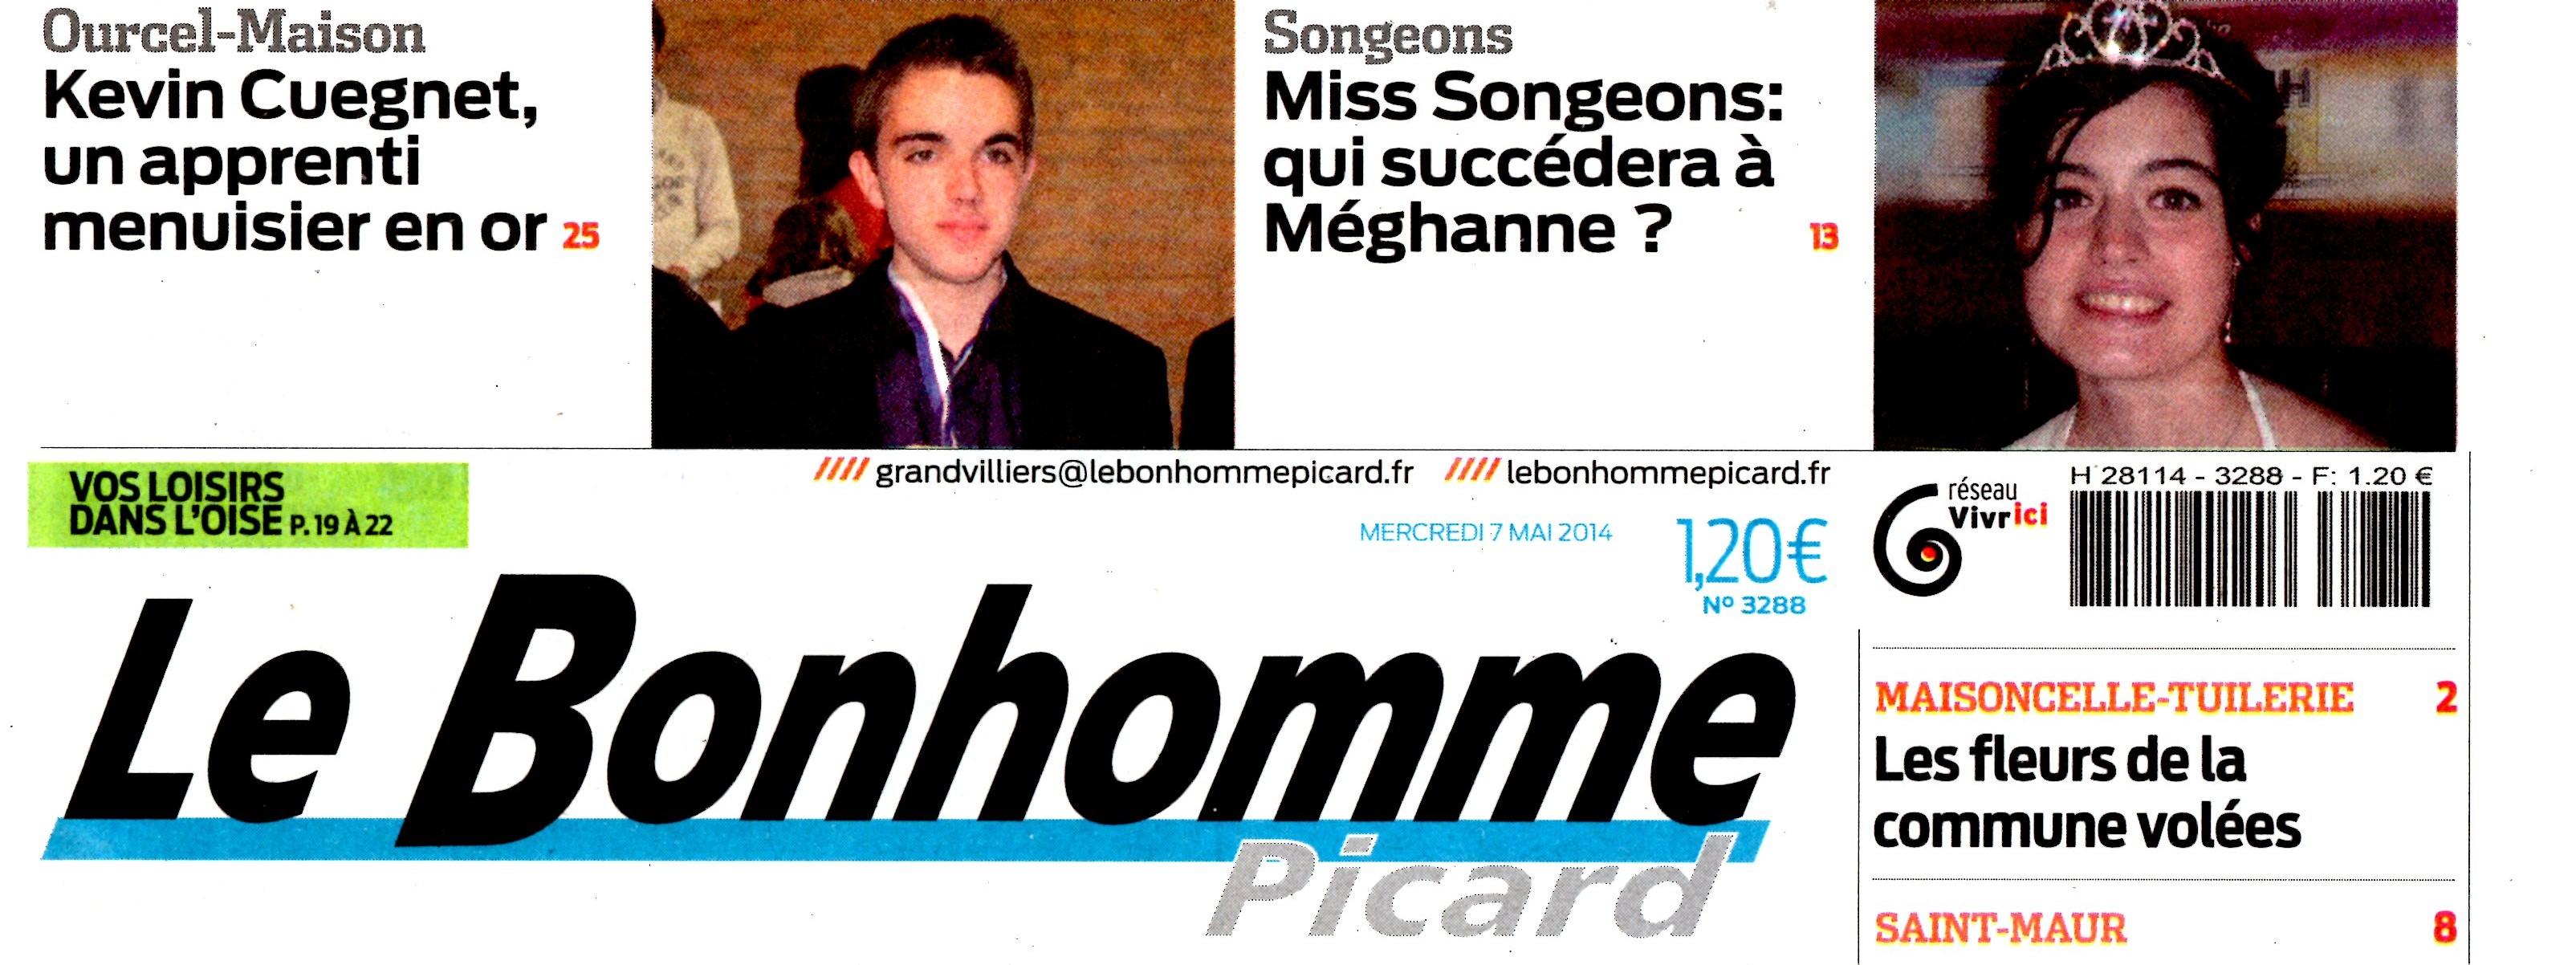 LE BONHOMME PICARD 7 MAI 2014001